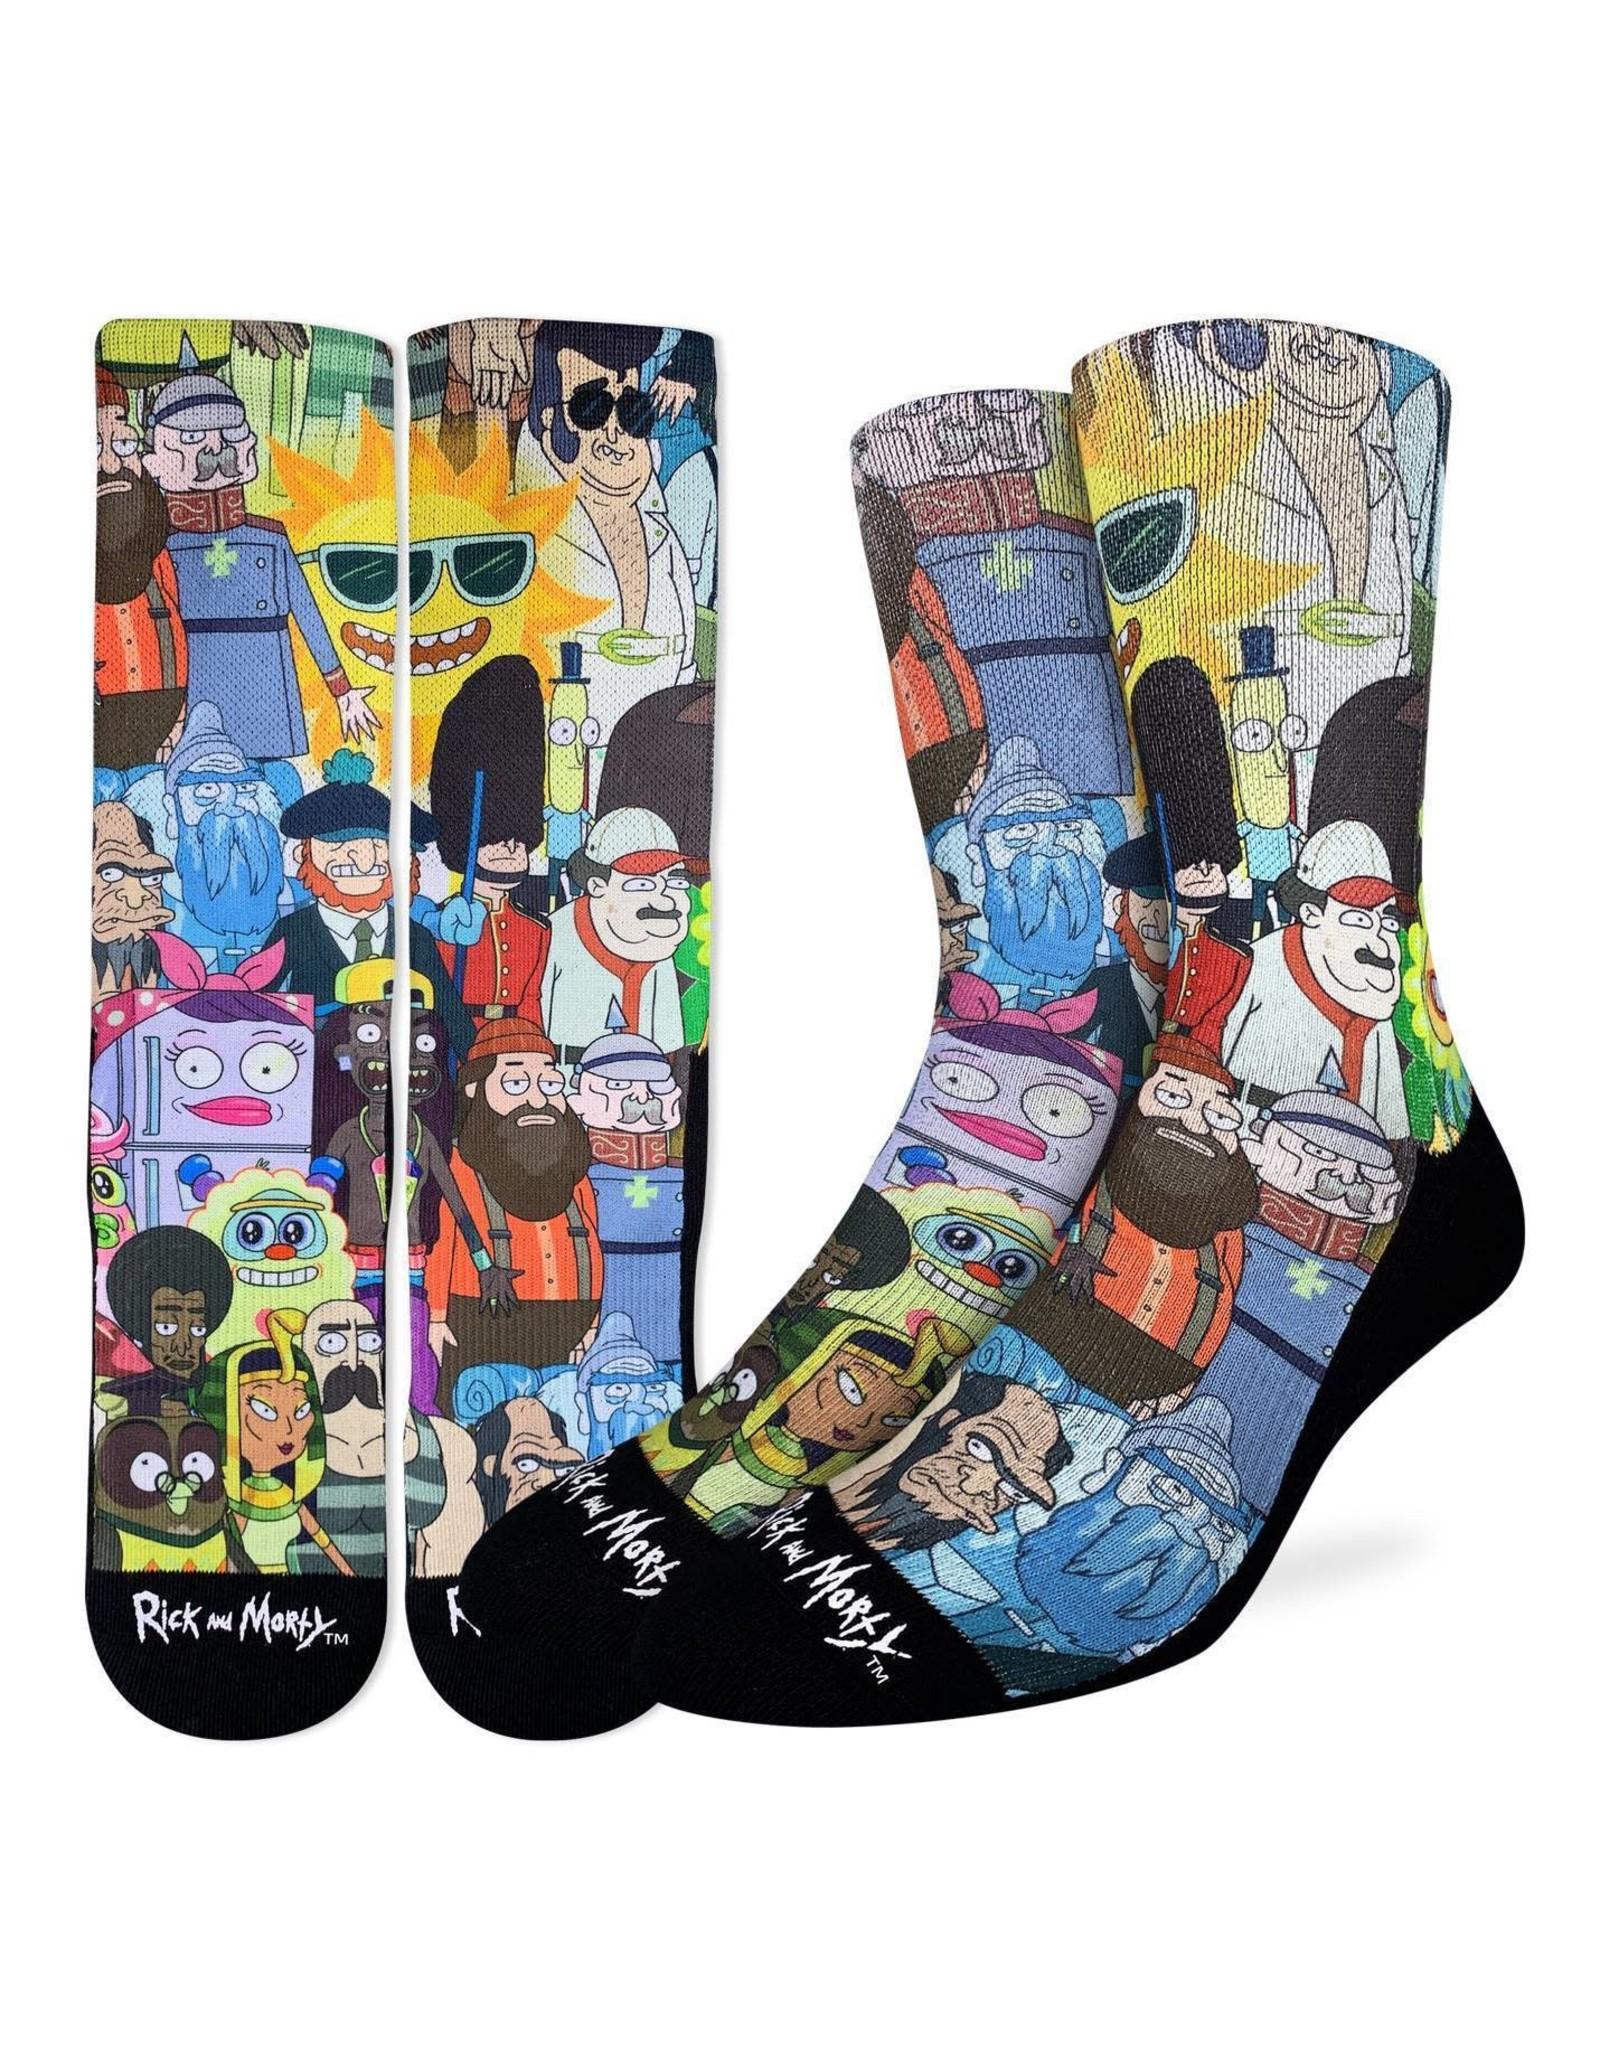 Good Luck Sock Rick/Morty Character Socks, 8-13